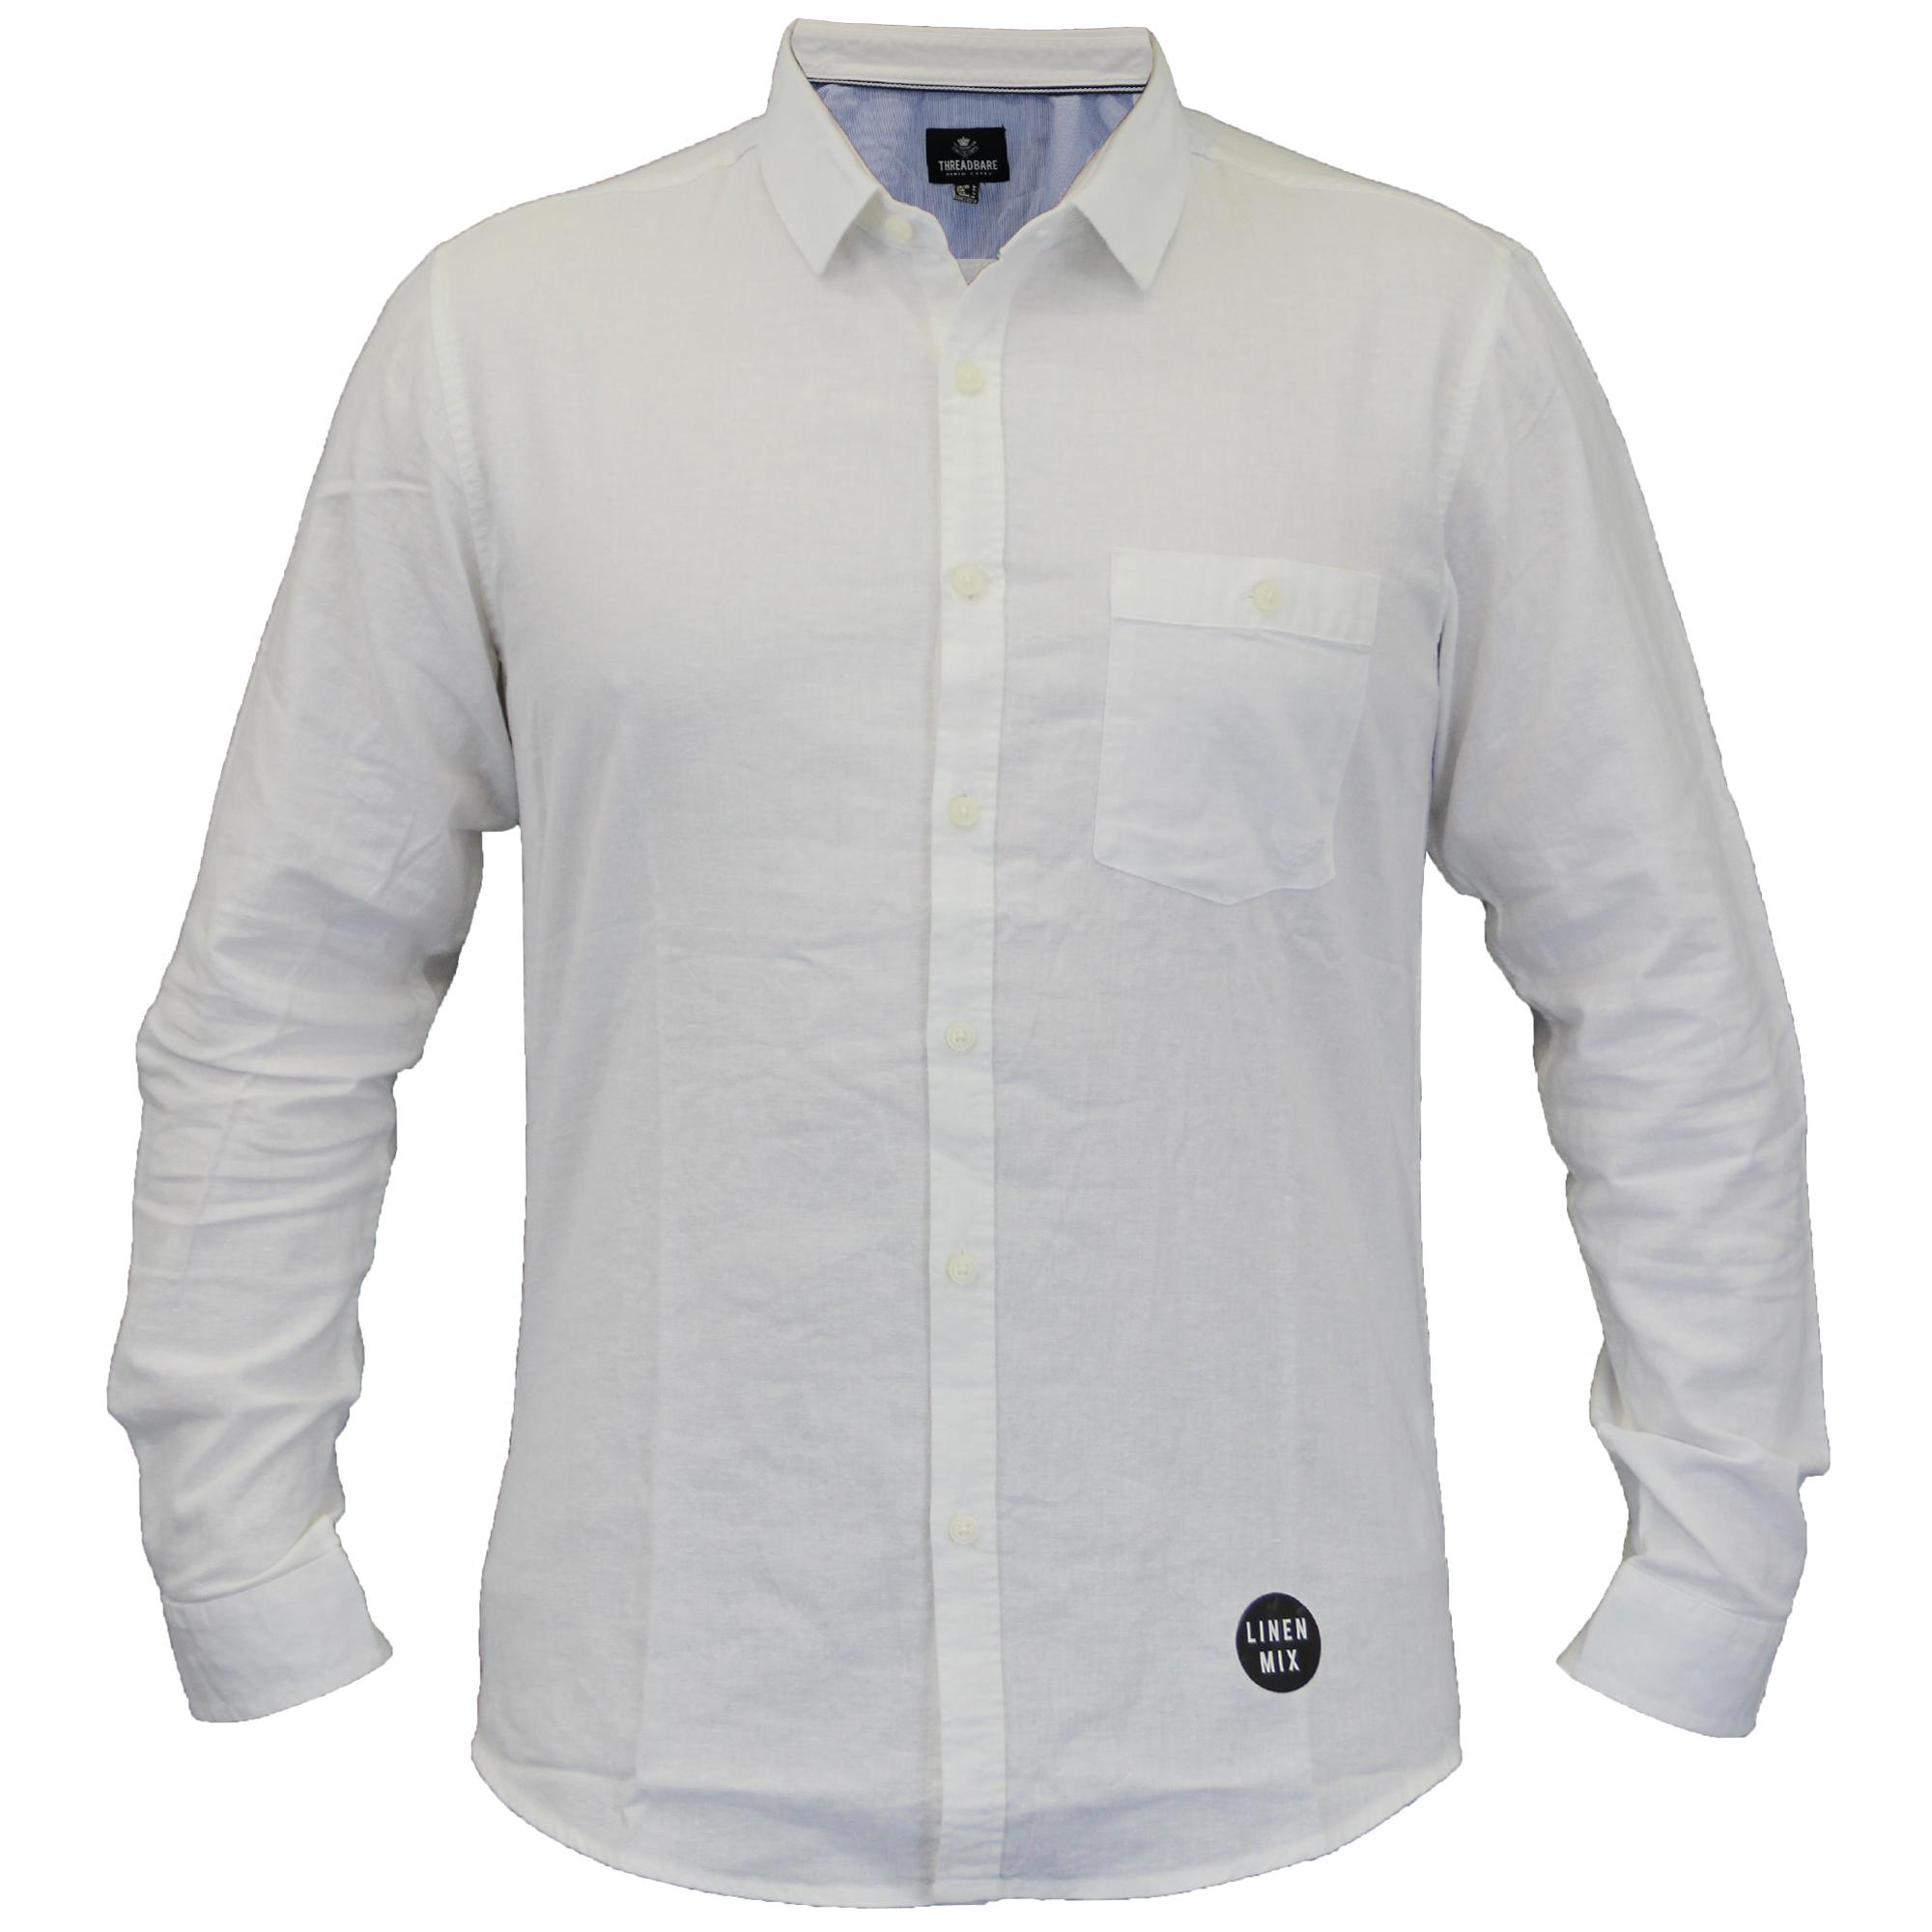 Mens linen shirt threadbare collared long sleeved formal for Mens summer linen shirts